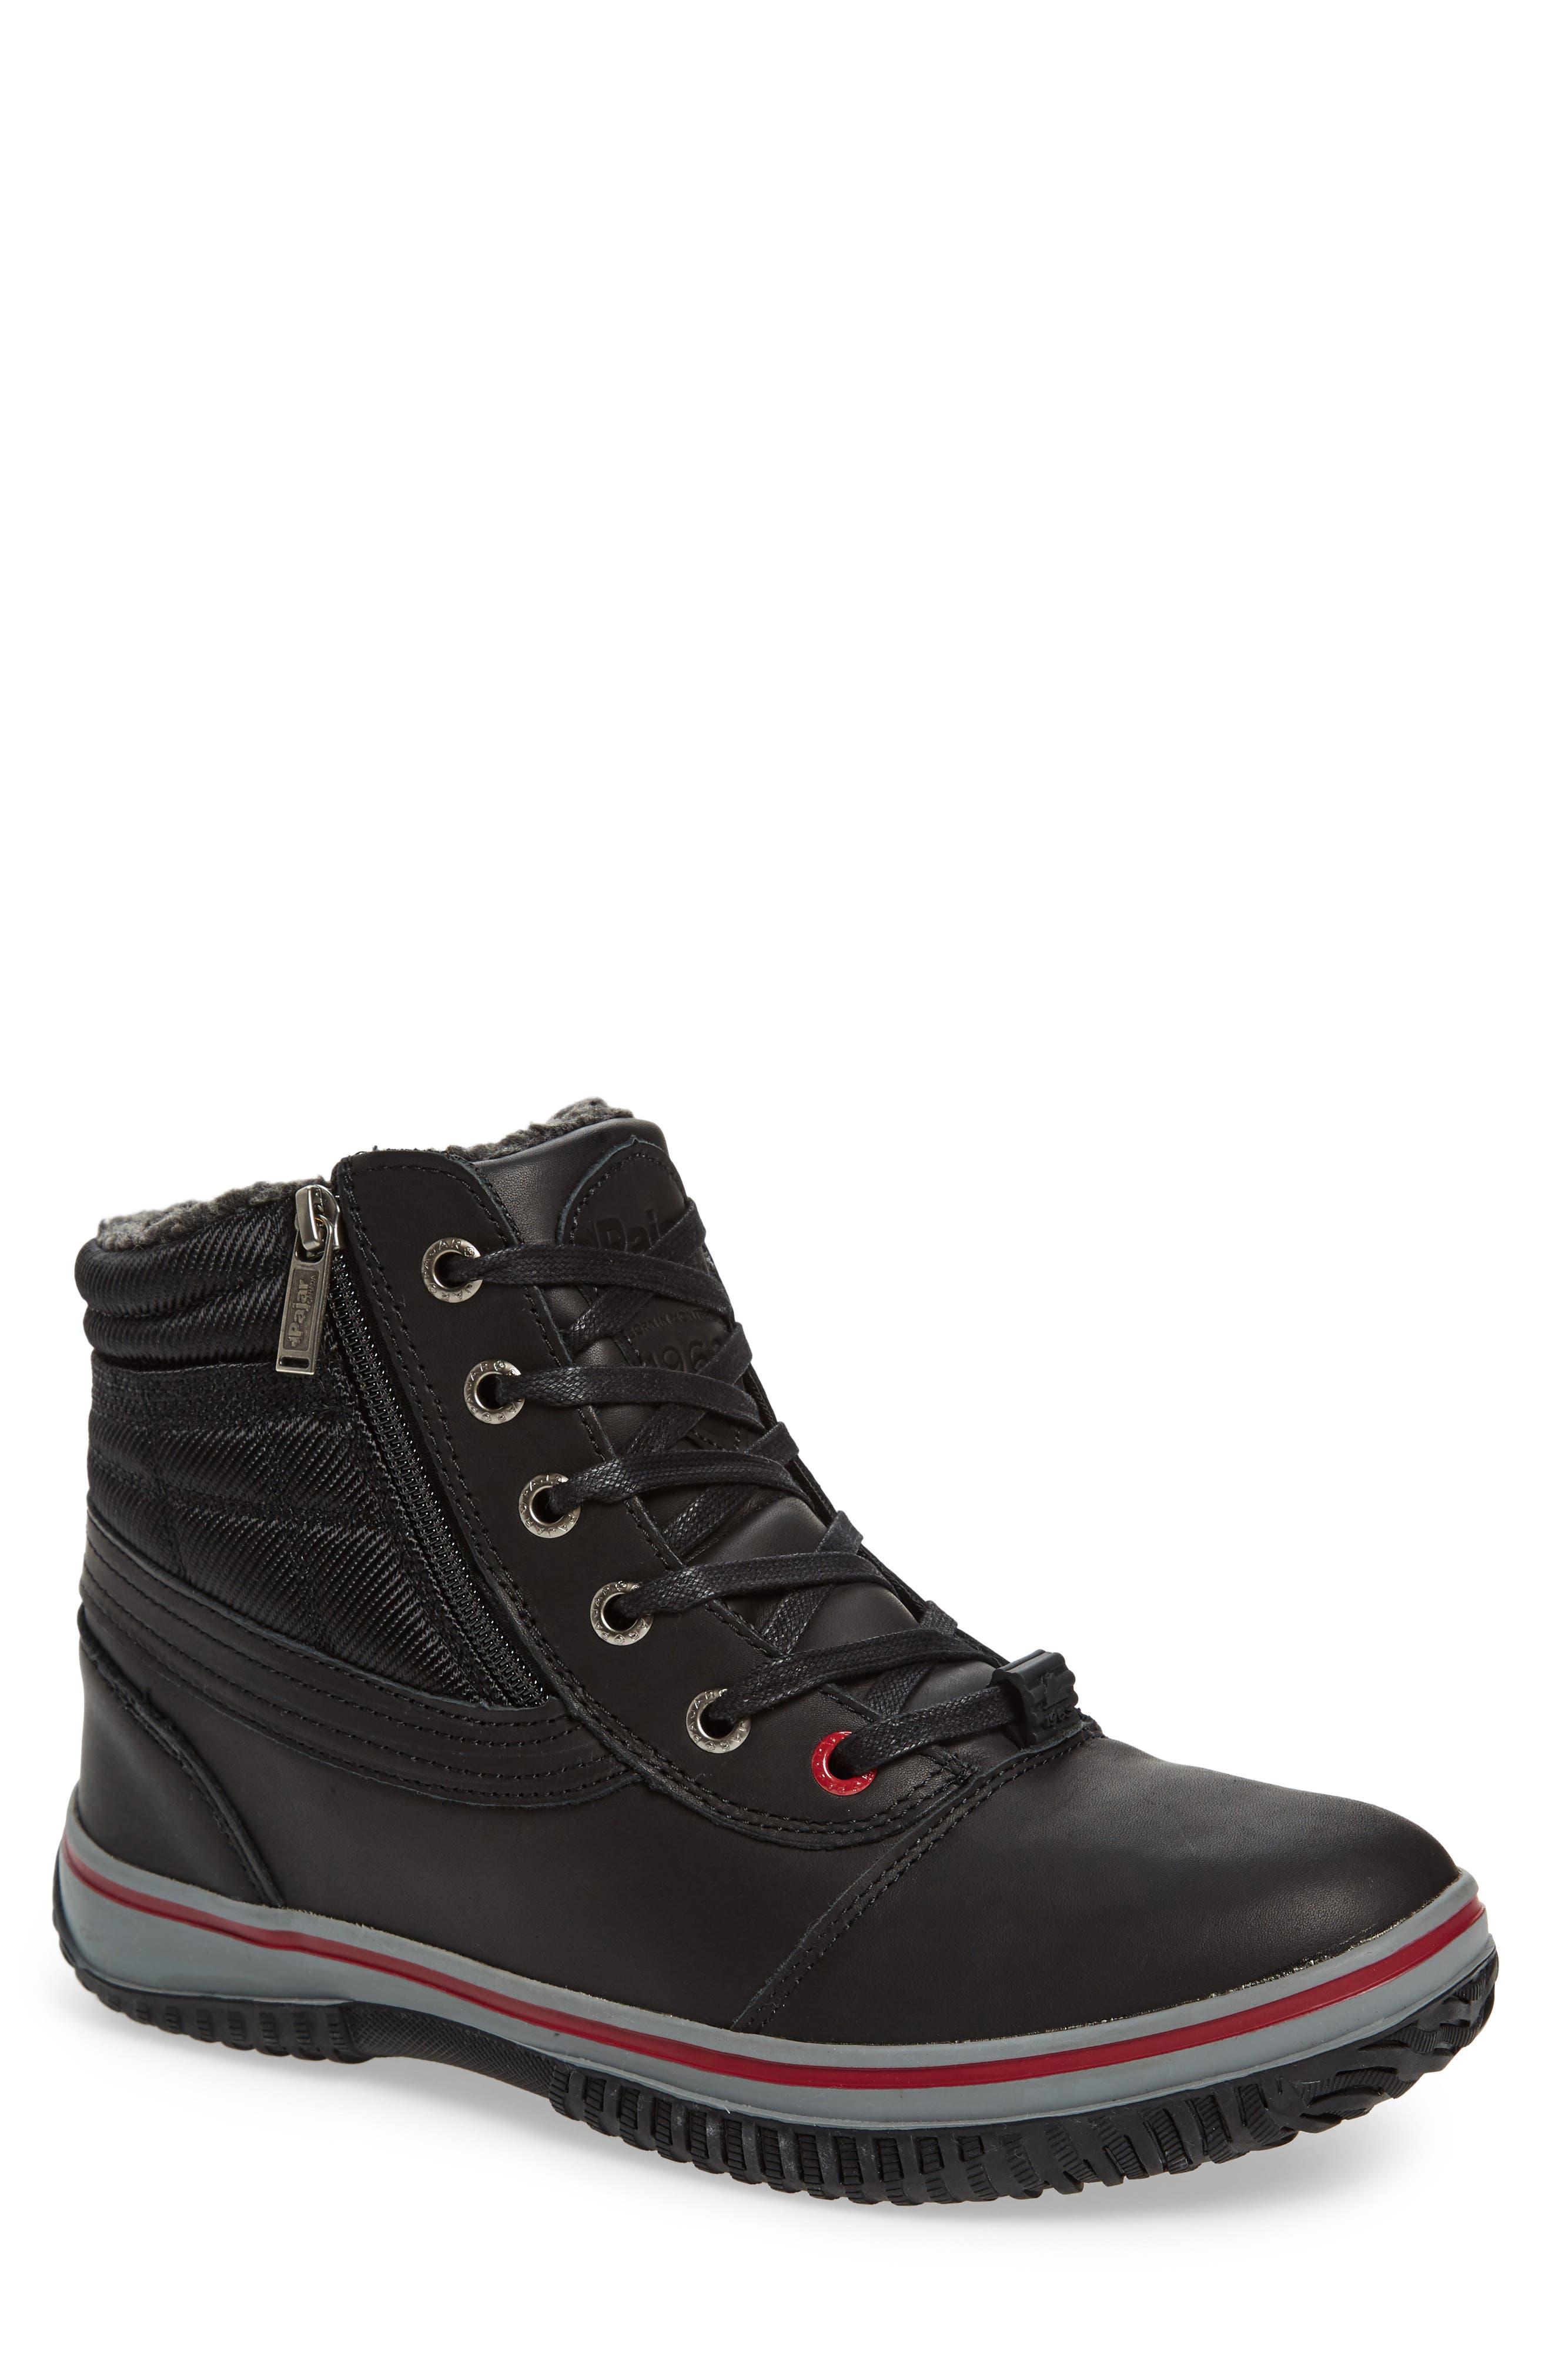 Tavin Waterproof Winter Boot,                             Main thumbnail 1, color,                             001